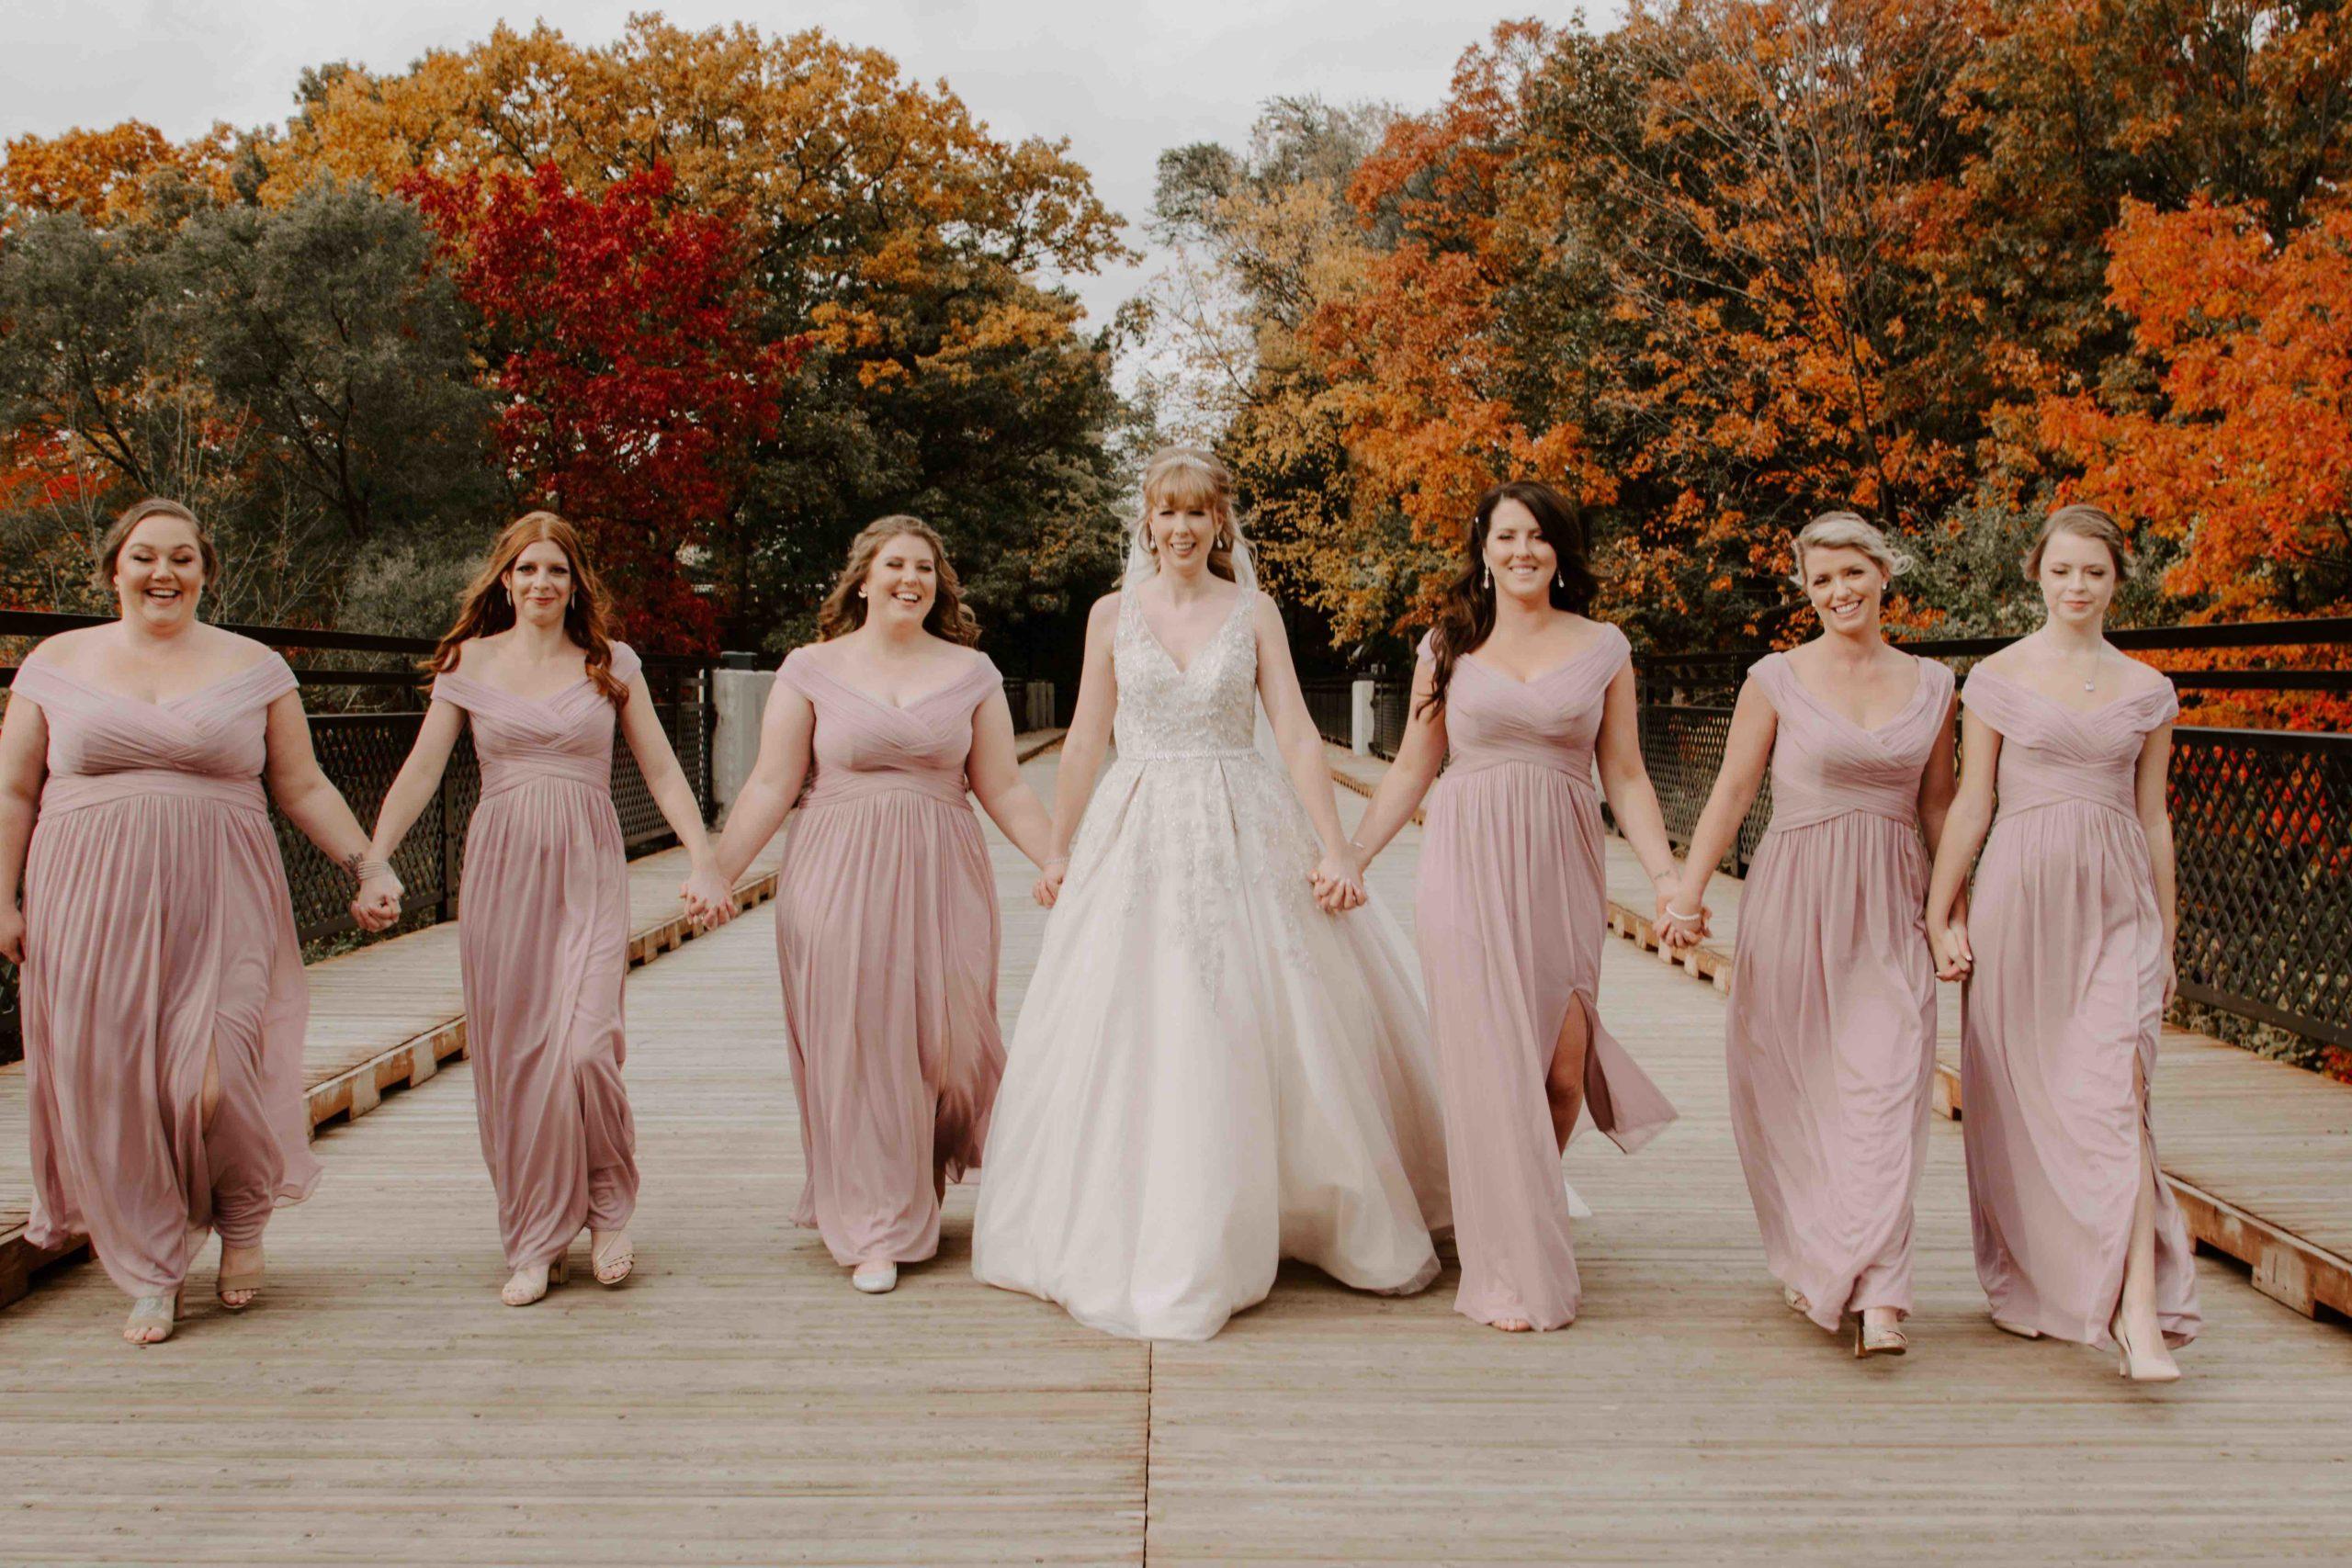 Best Selling Bridesmaid Dresses   David's Bridal Blog